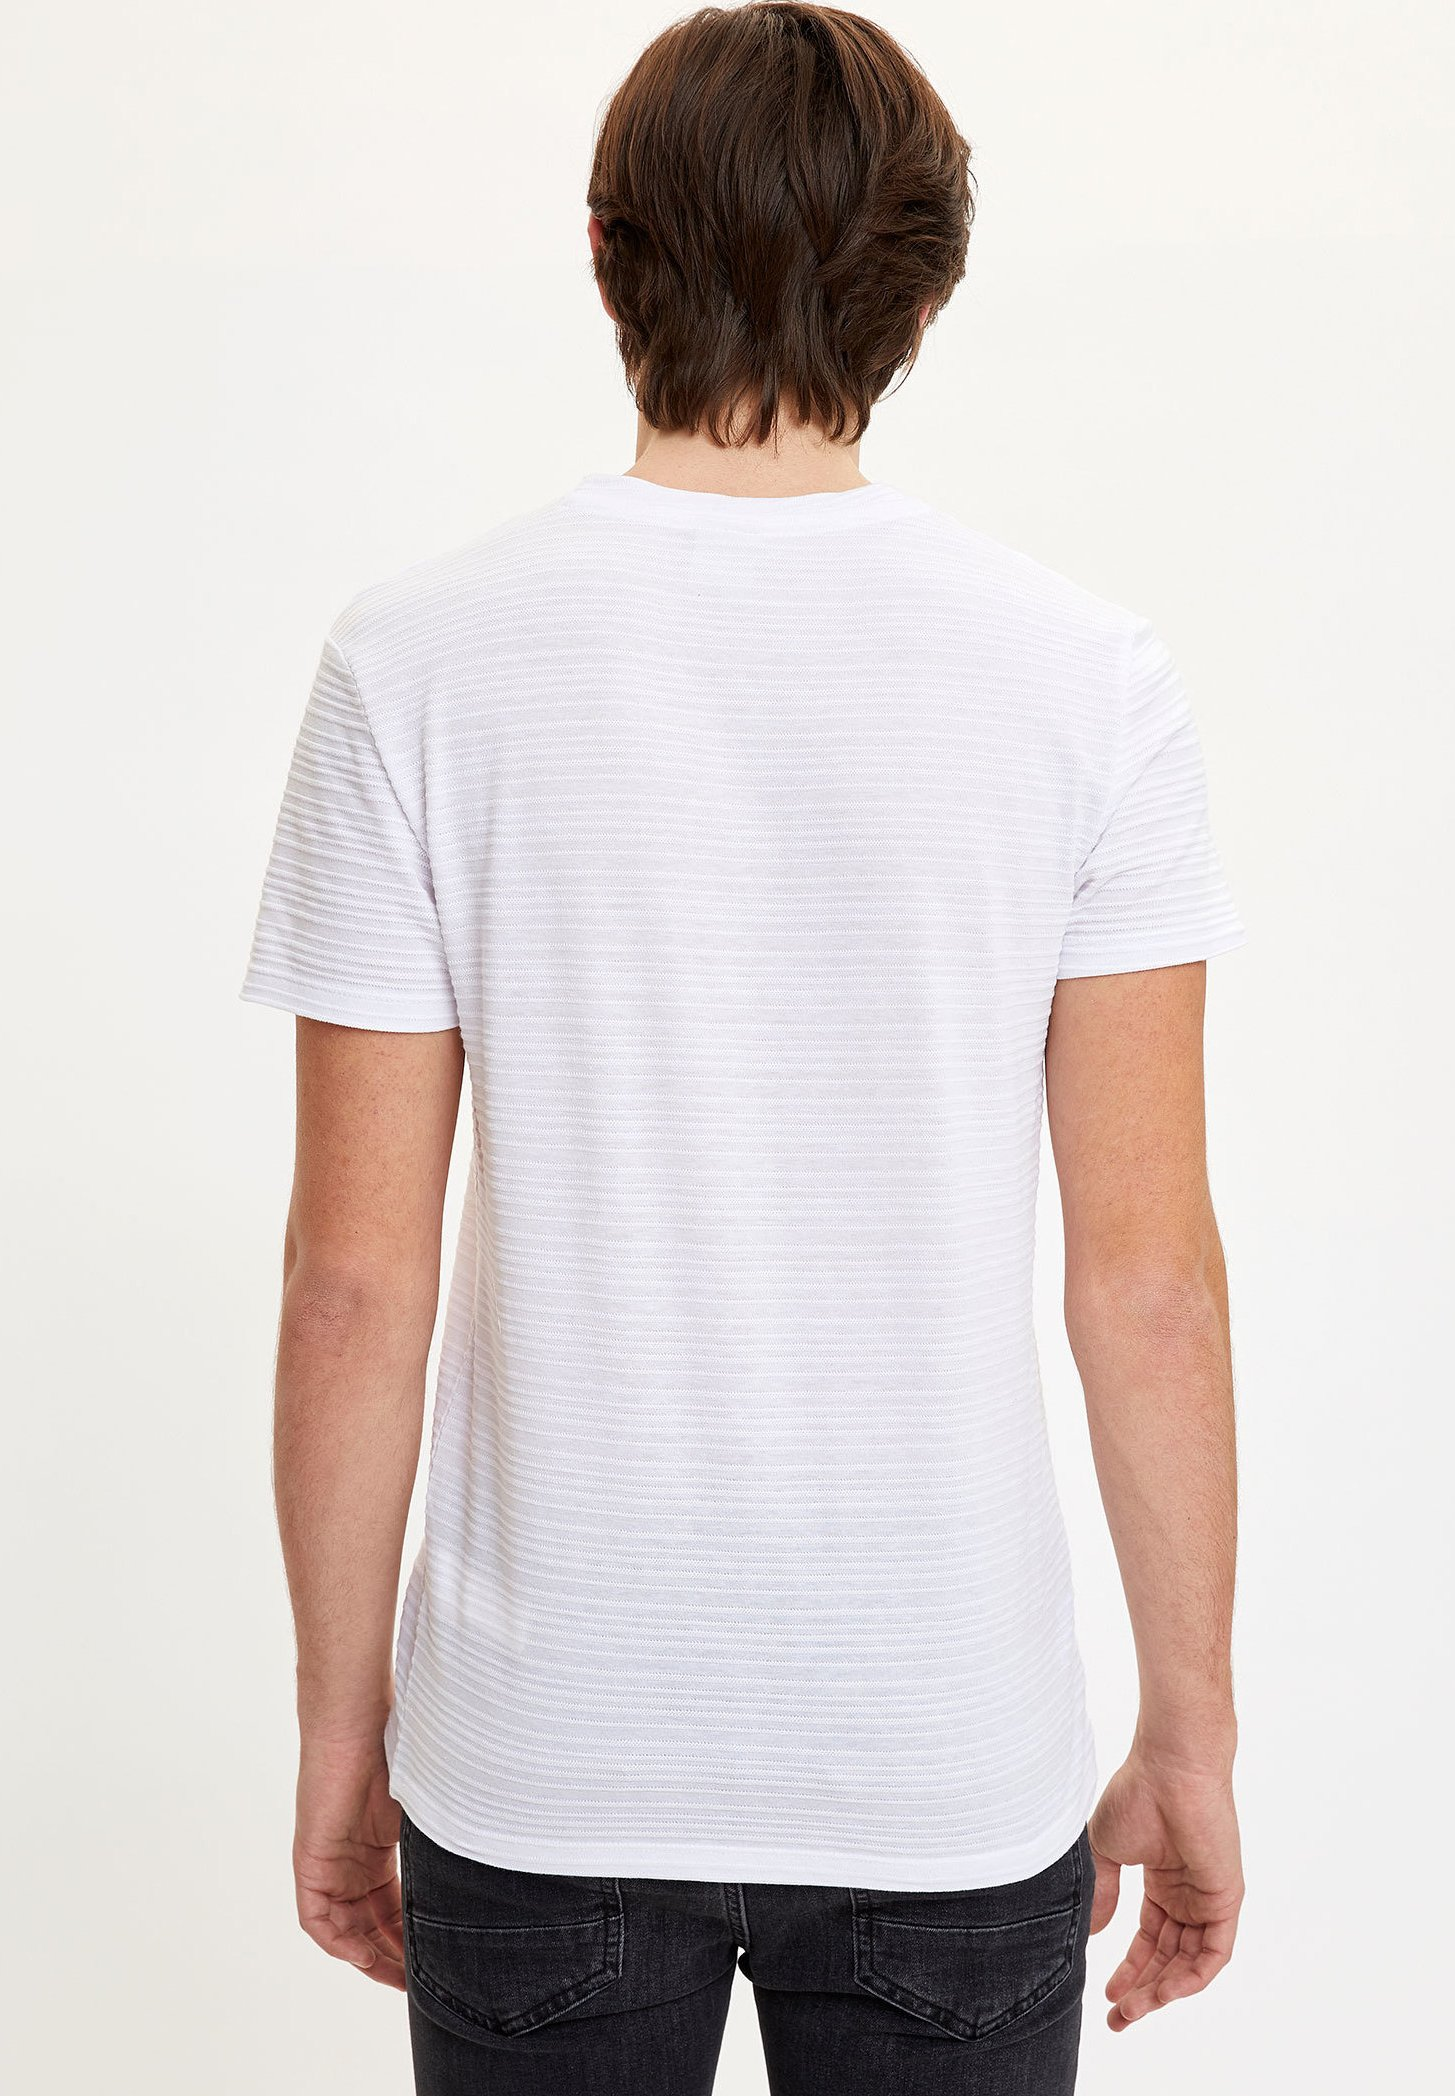 DeFacto Print T-shirt - white mhAJq